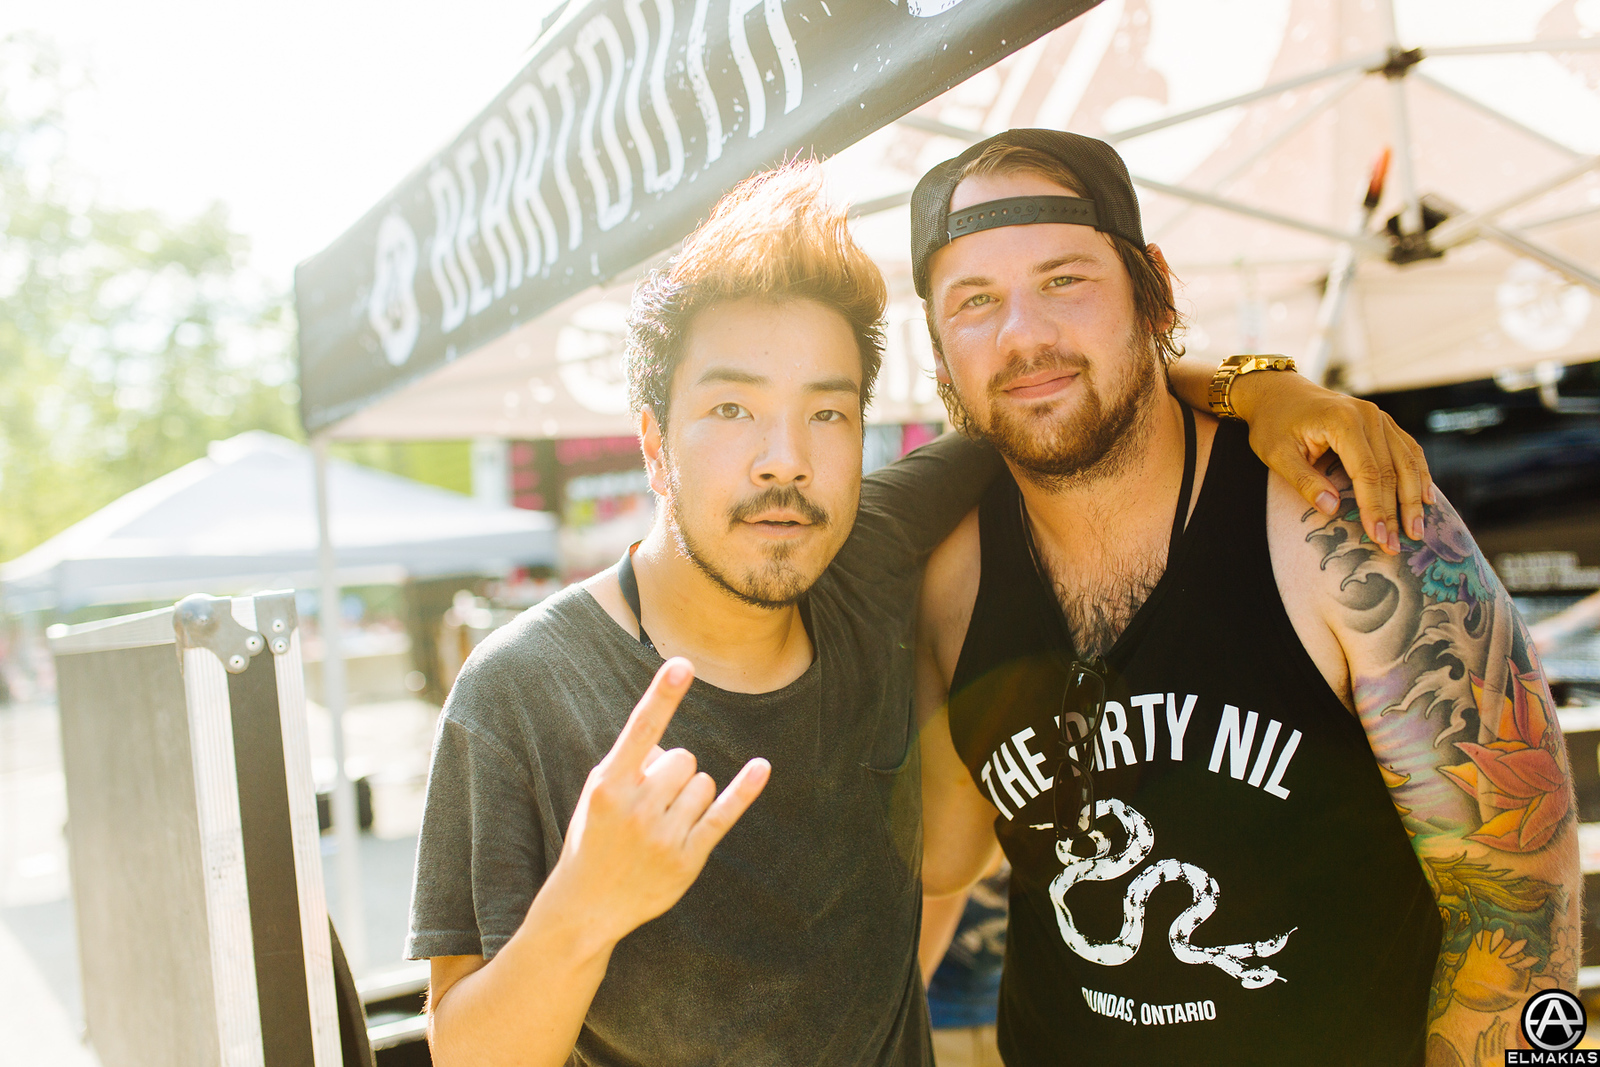 Kenta Koie of Crossfaith and Caleb Shomo of Beartooth at Vans Warped Tour 2015 by Adam Elmakias